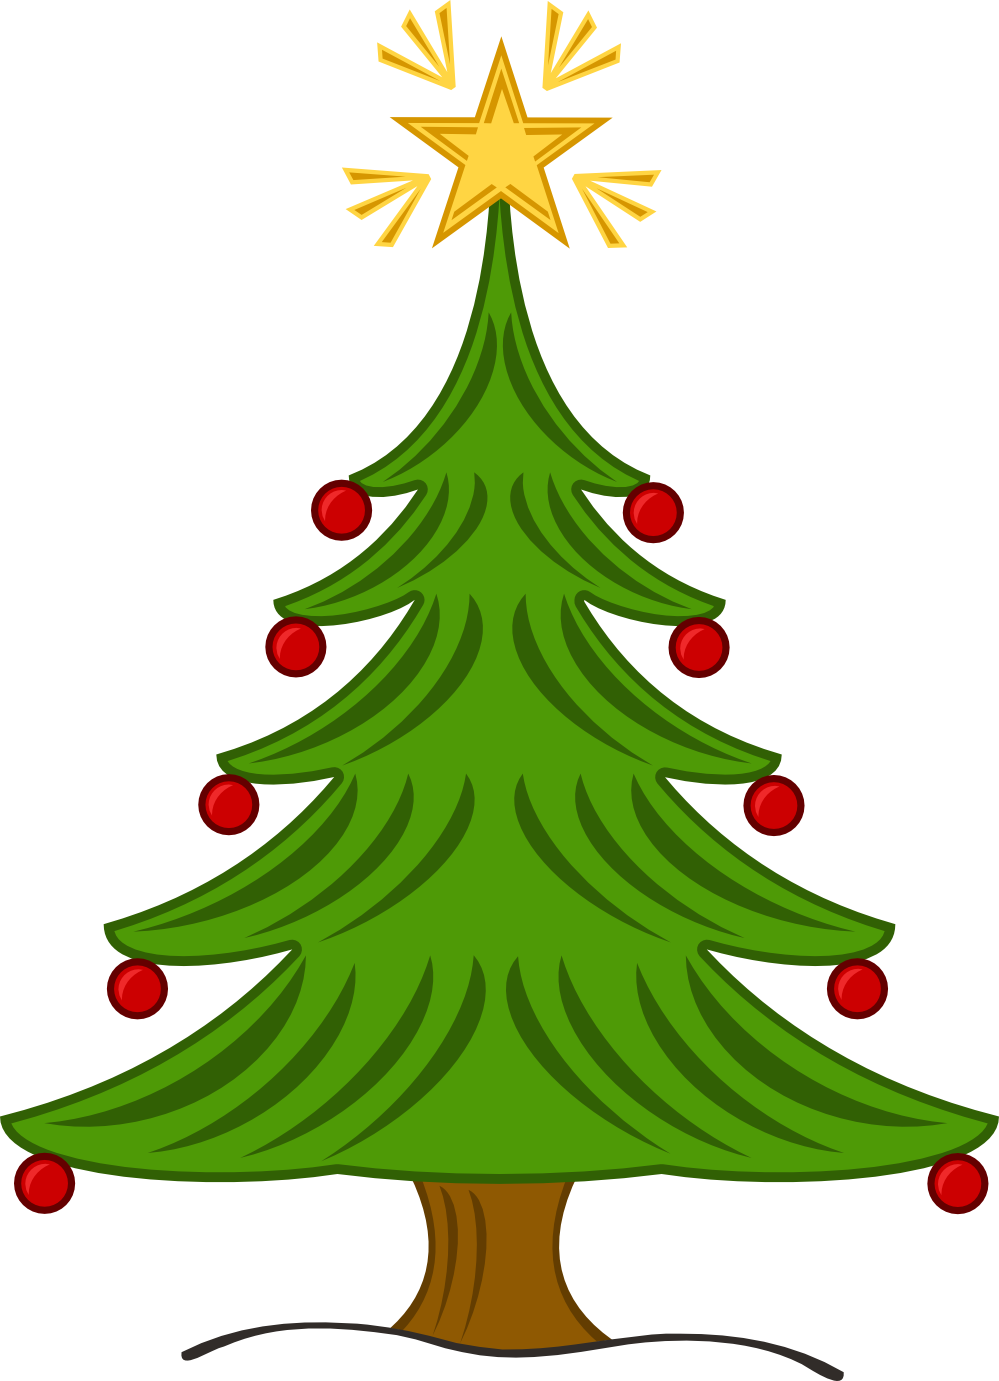 X Mas Tree Clipart Christmas Clipart Free Christmas Tree Clipart Christmas Tree Images